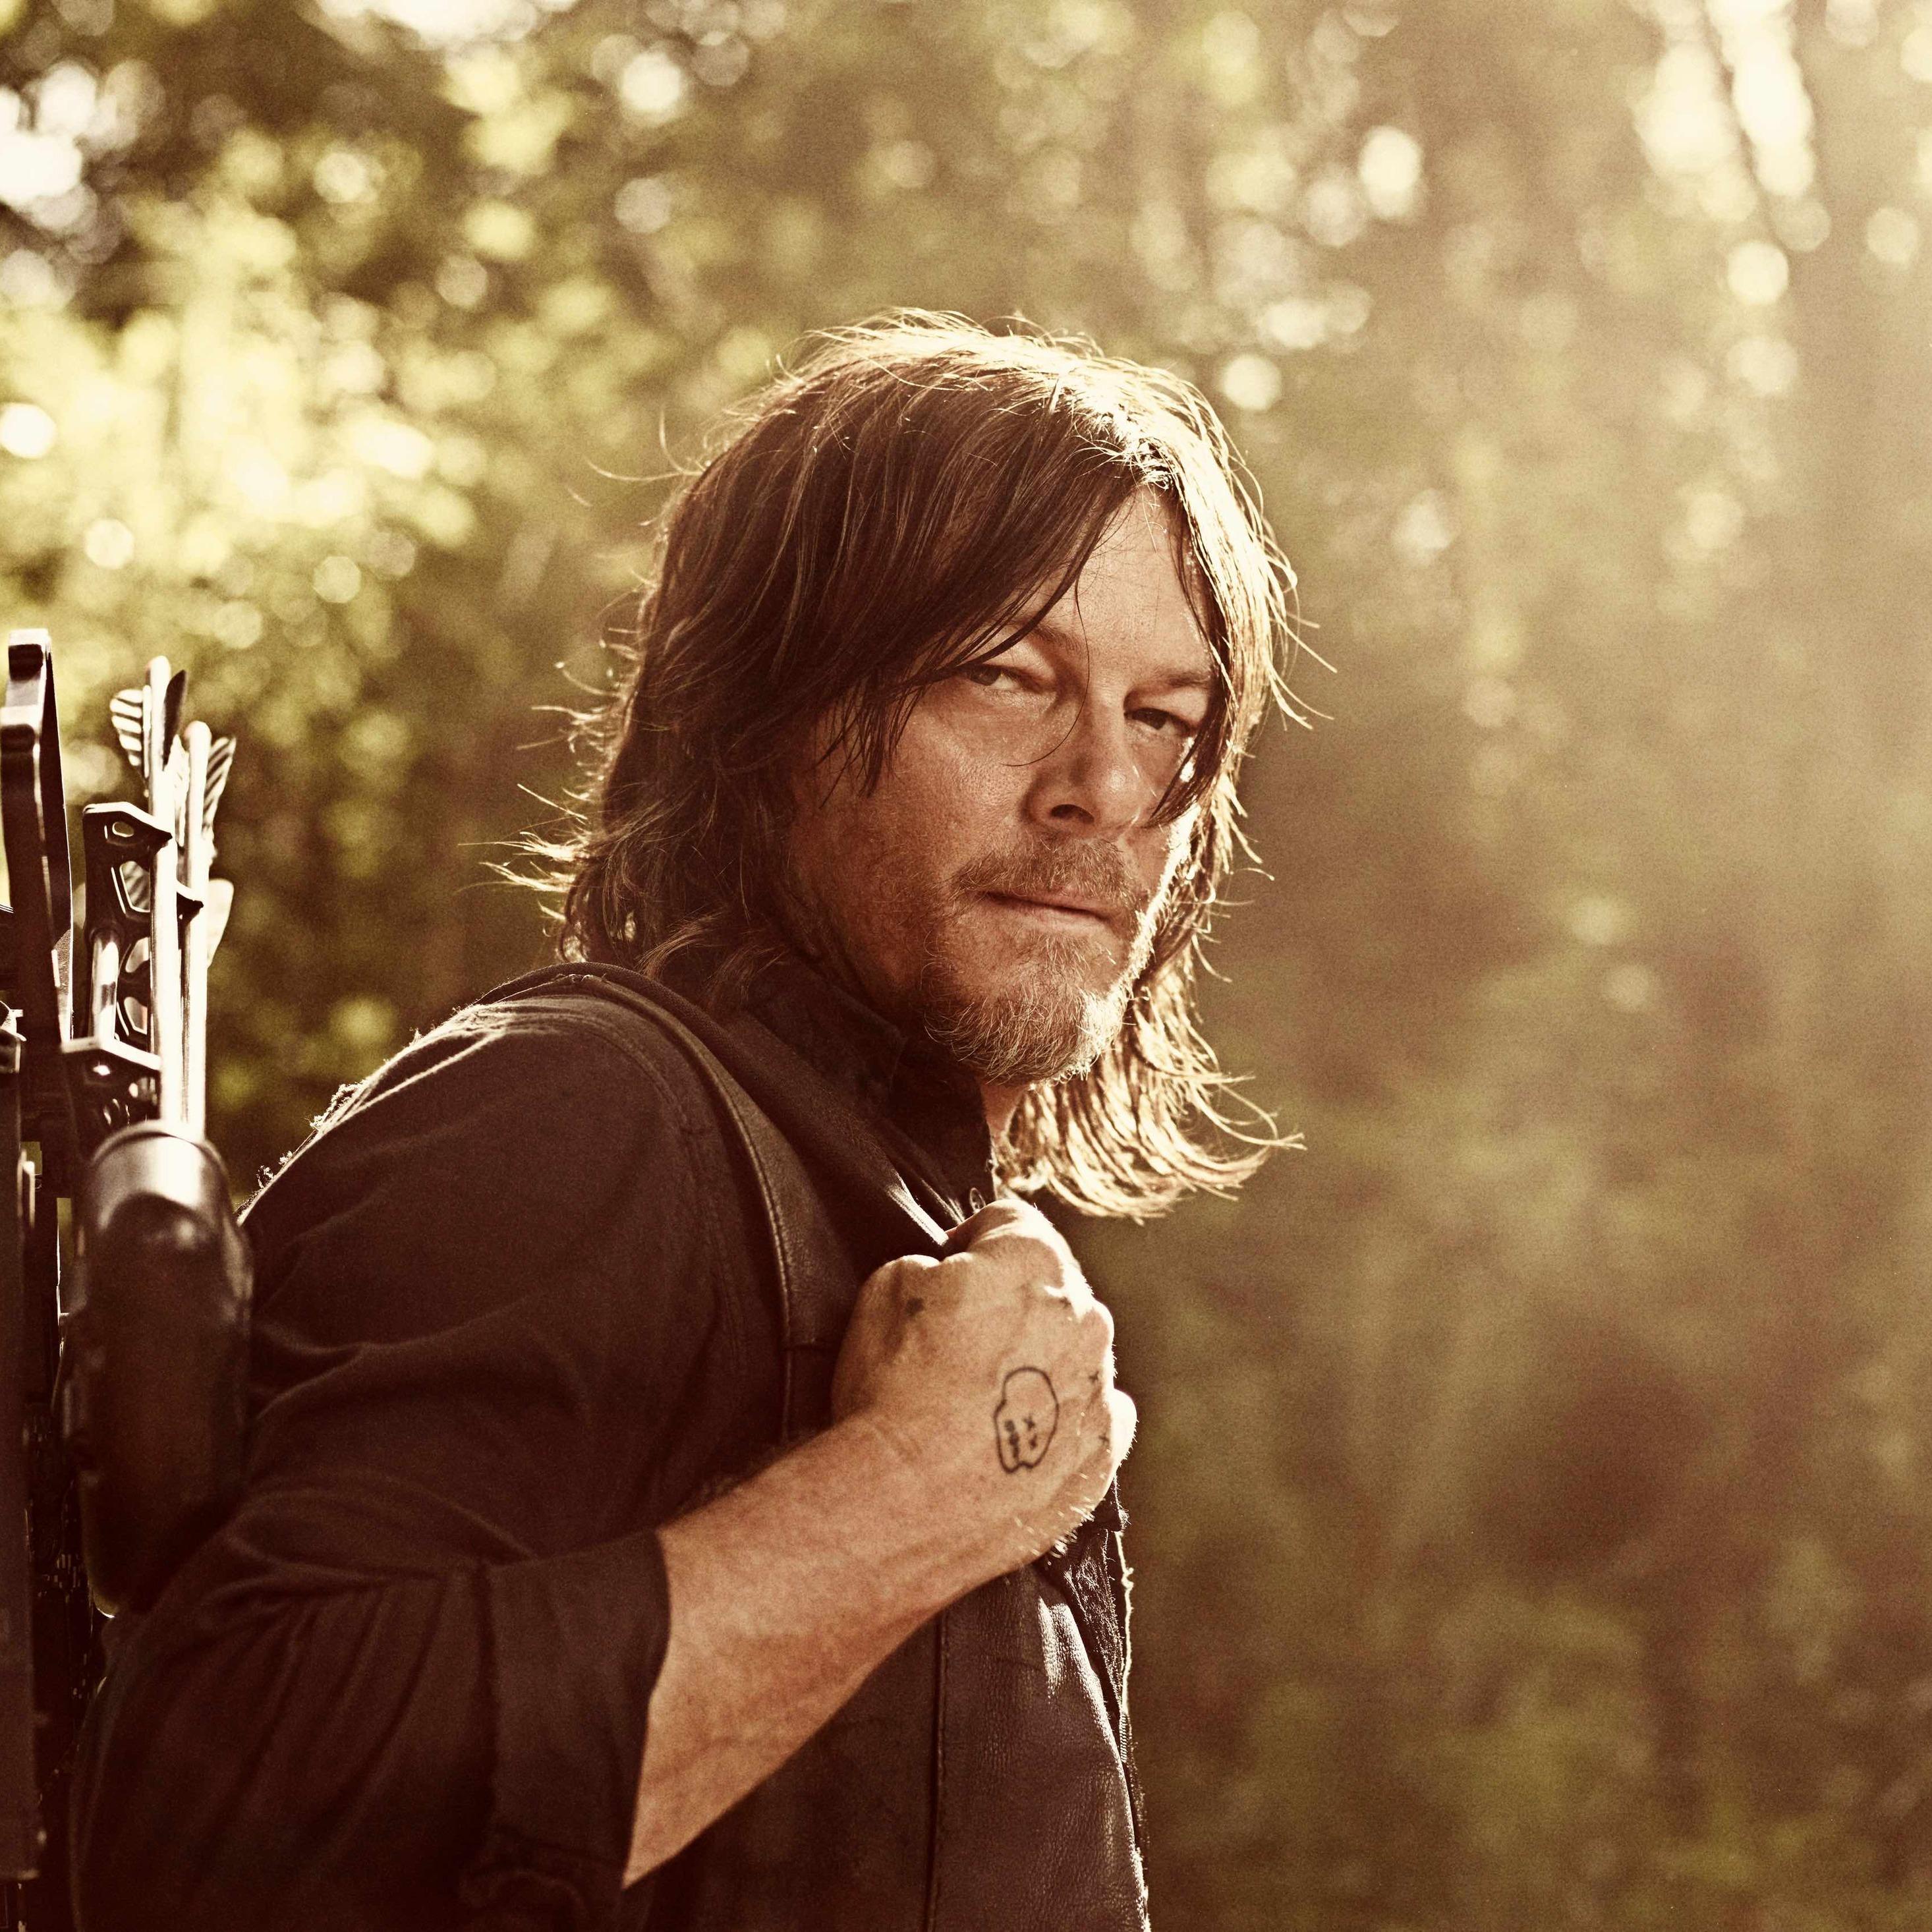 2932x2932 The Walking Dead Season 8 2018 Norman Reedus Ipad Pro